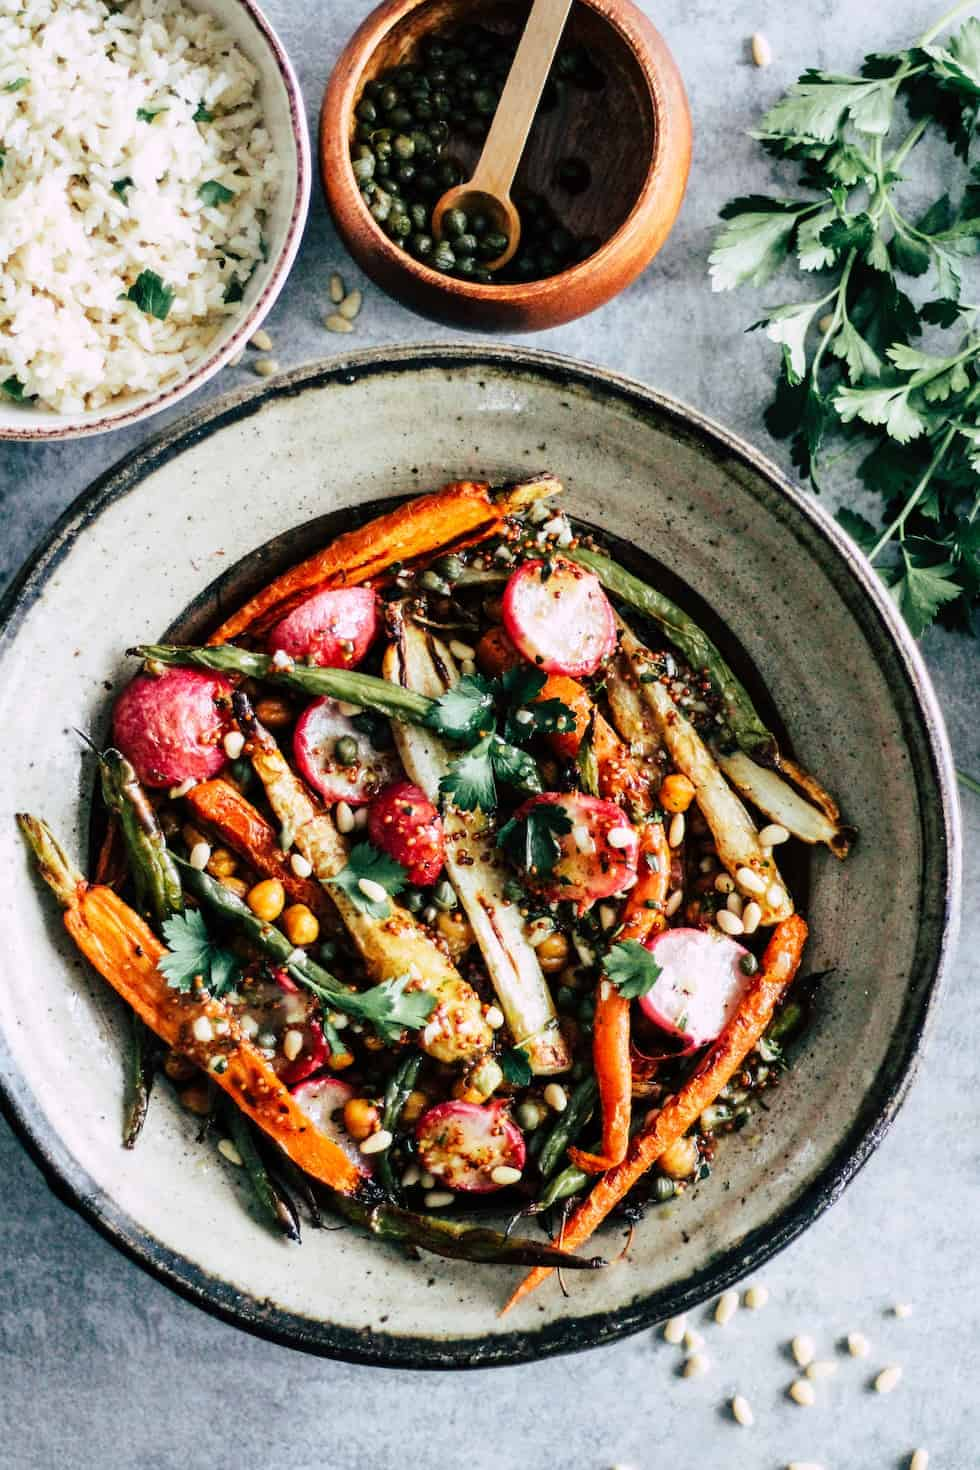 Vegetarian Chickpea Sheet Pan Dinner in ceramic bowl.